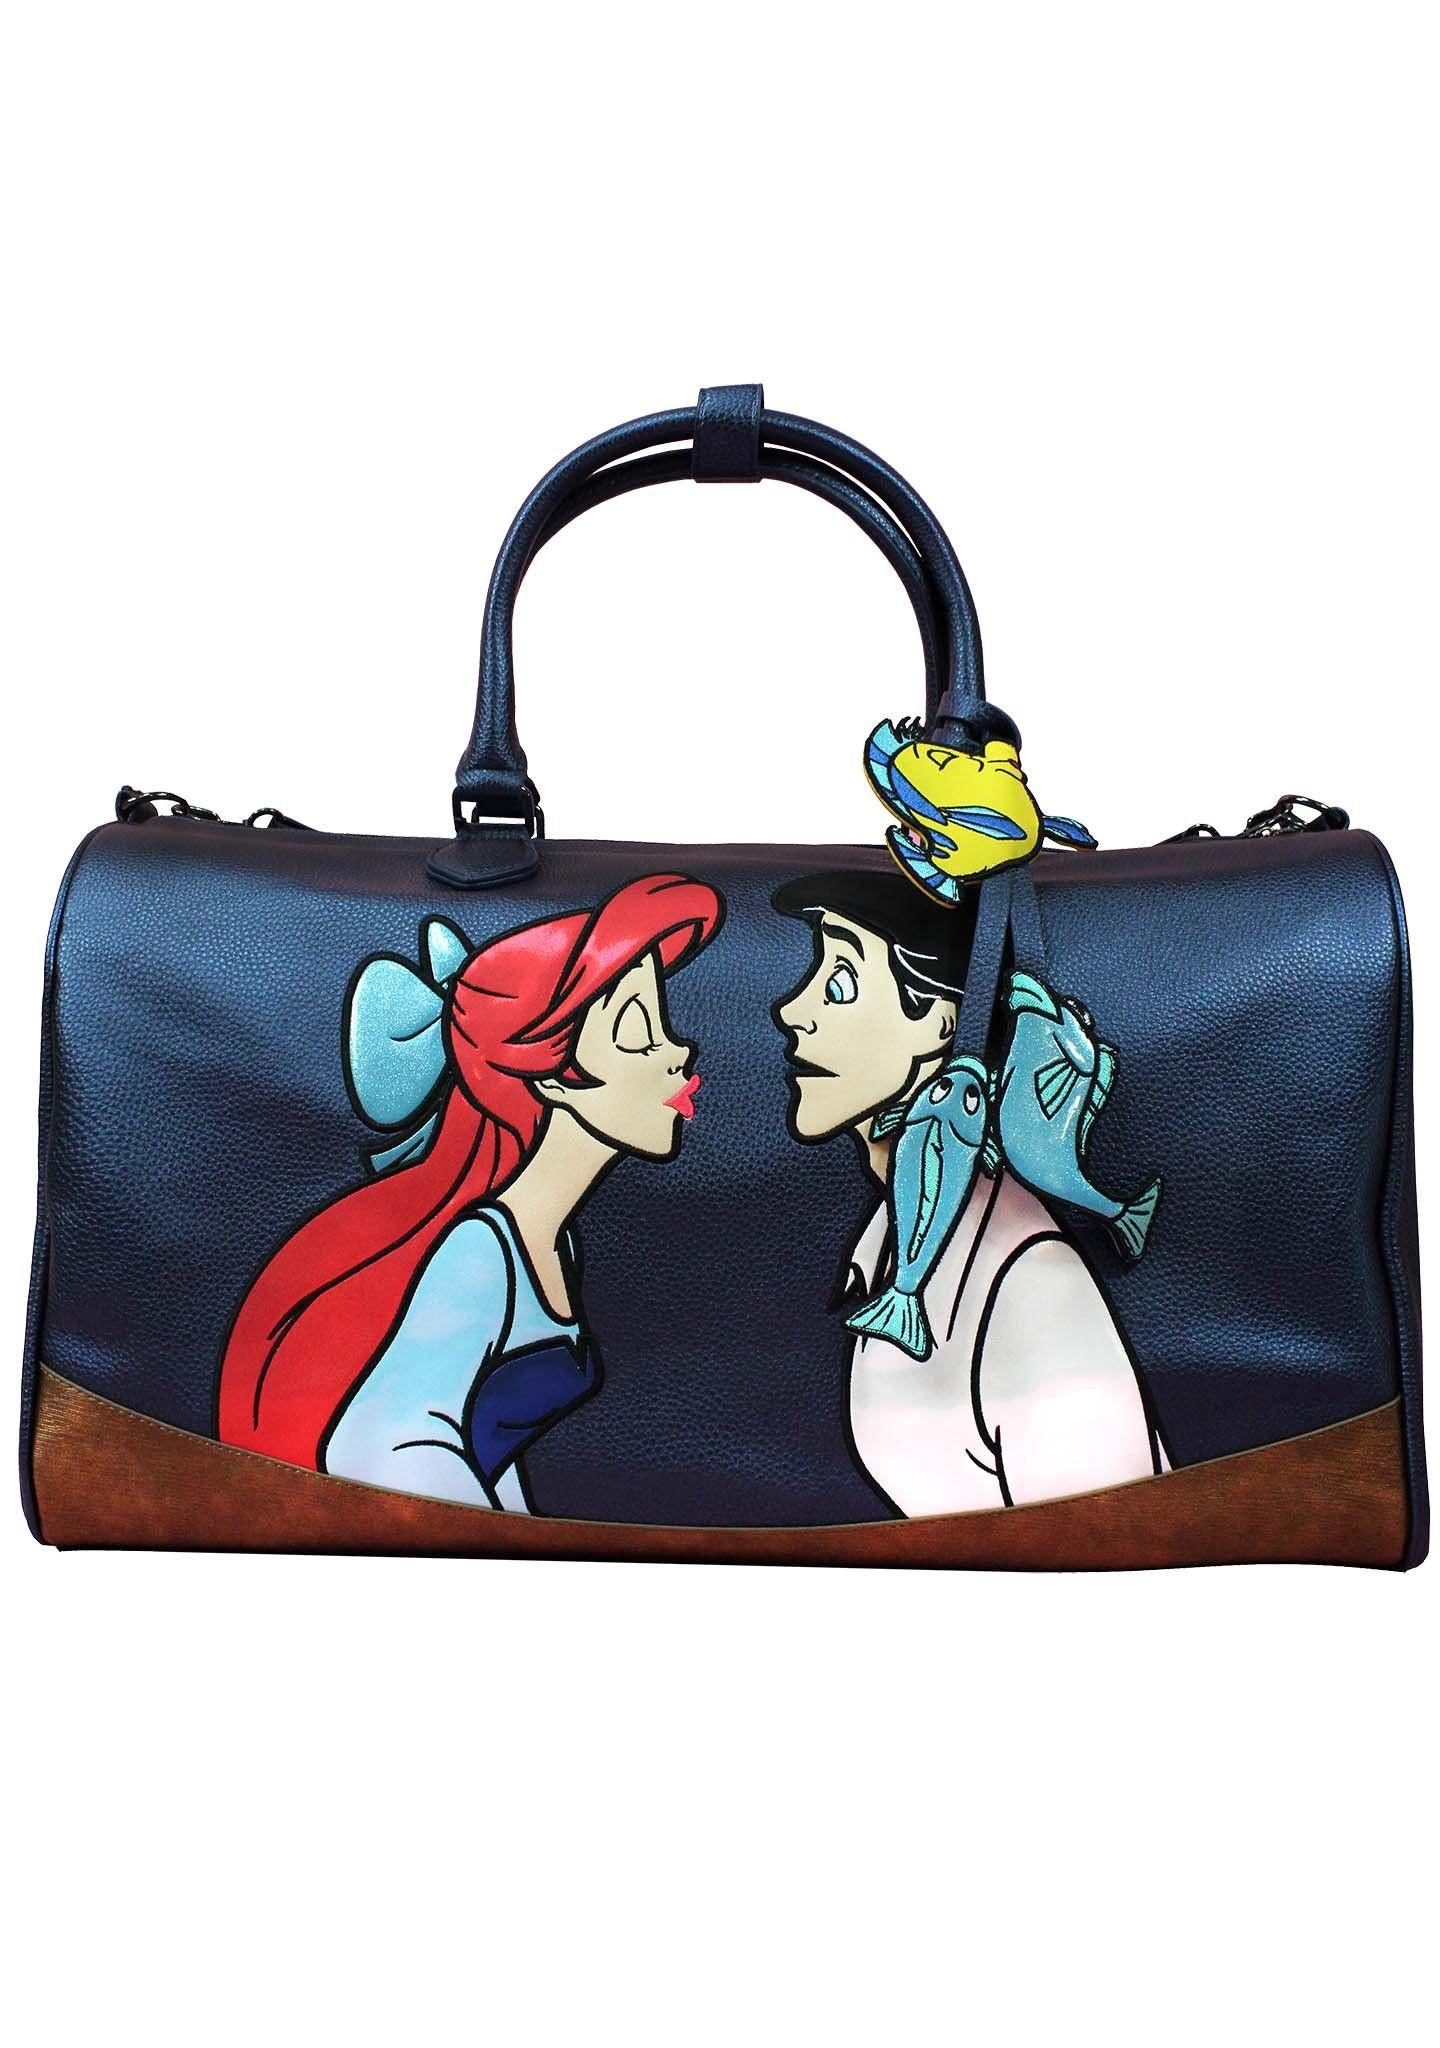 X Disney Little Mermaid Travel Bag